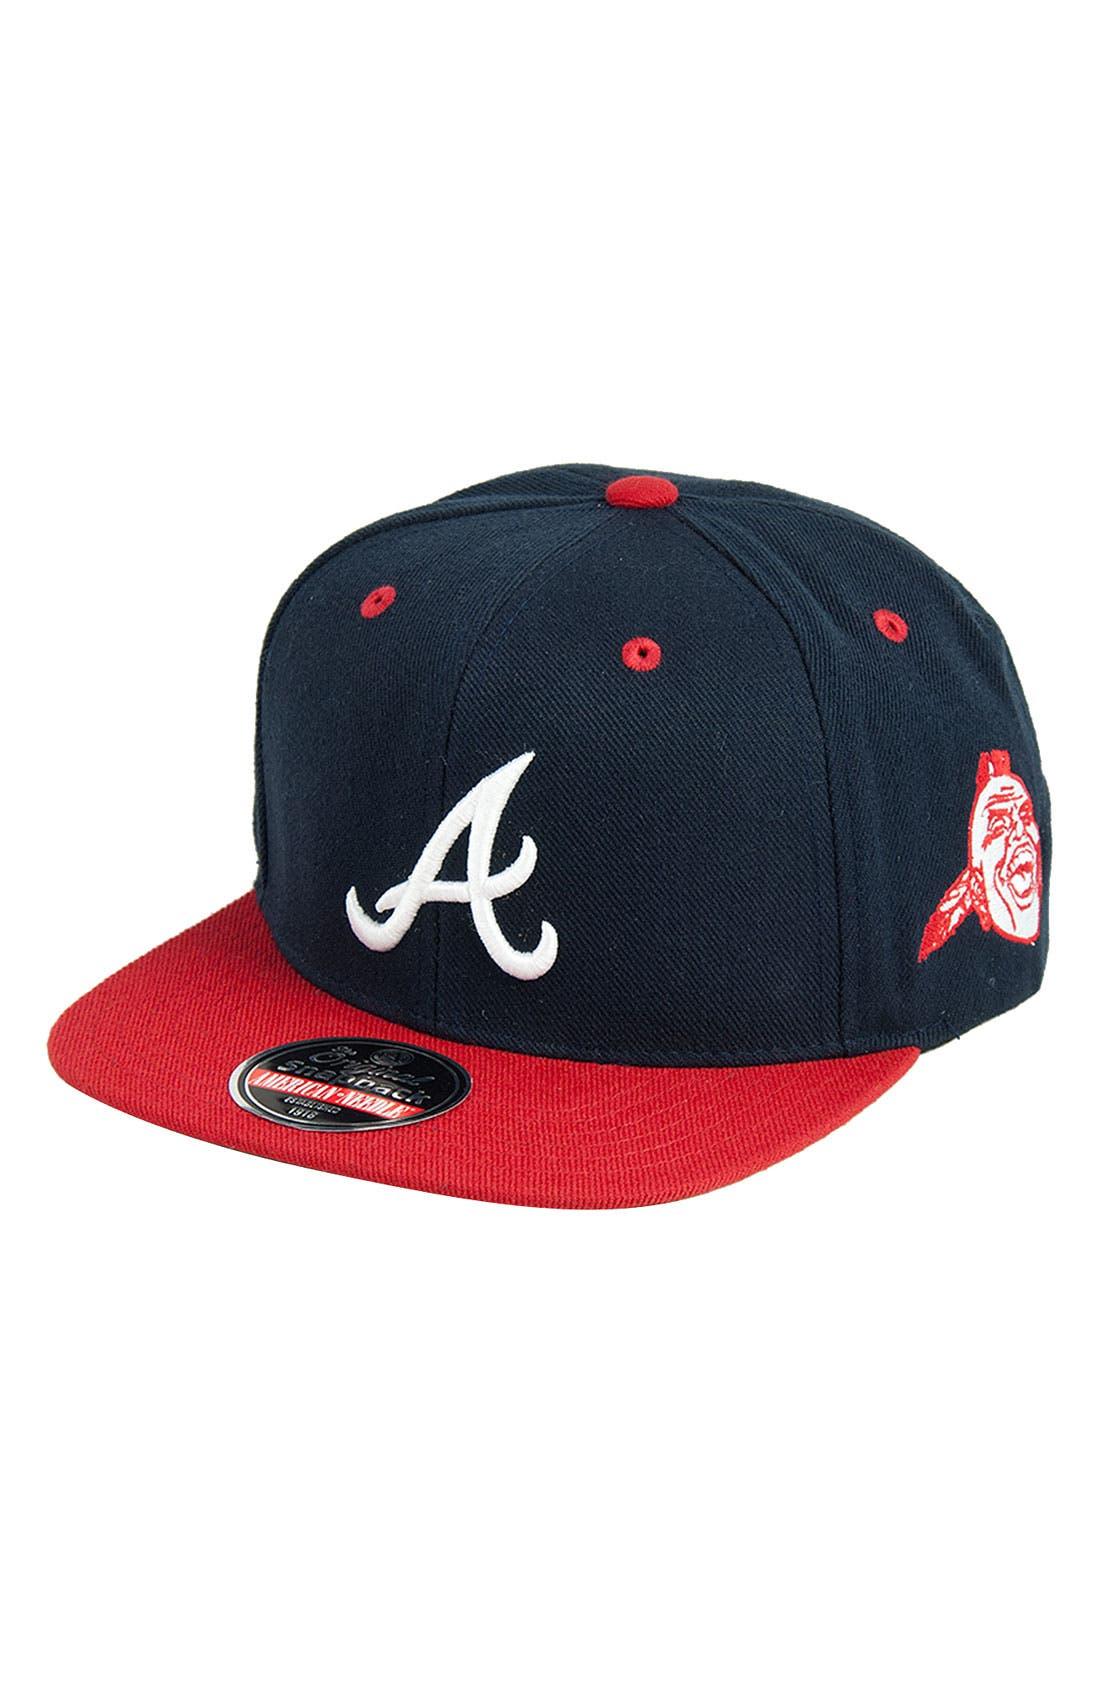 Main Image - American Needle 'Blockhead Braves' Snapback Baseball Cap